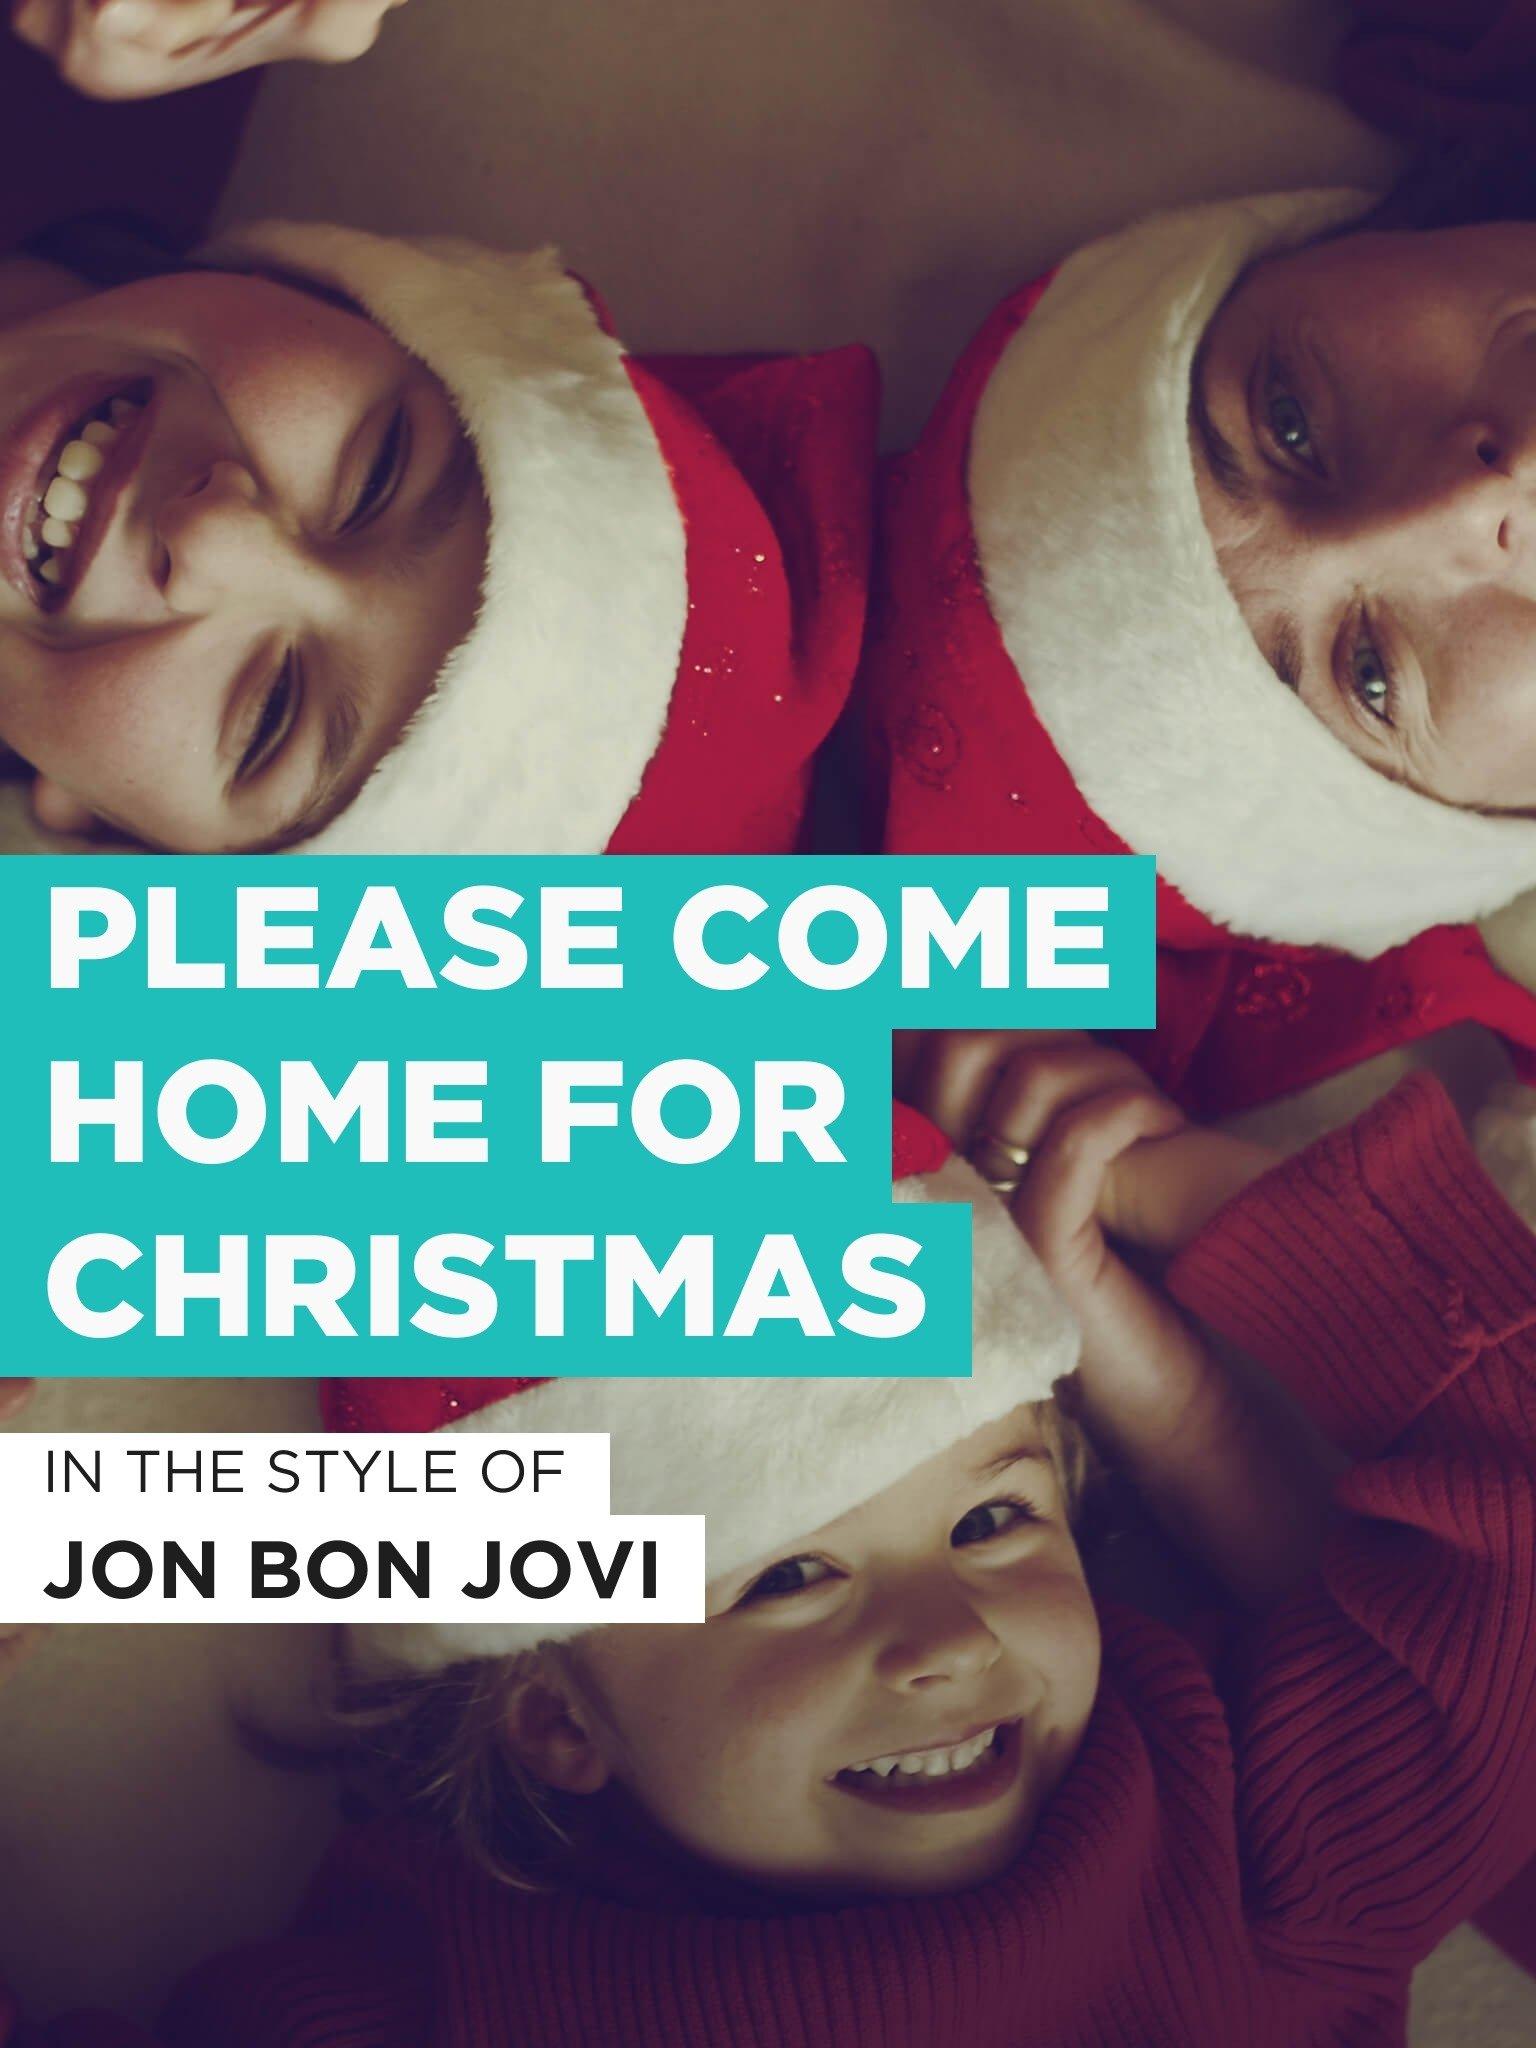 Amazon.com: Please Come Home For Christmas: Jon Bon Jovi, Not ...